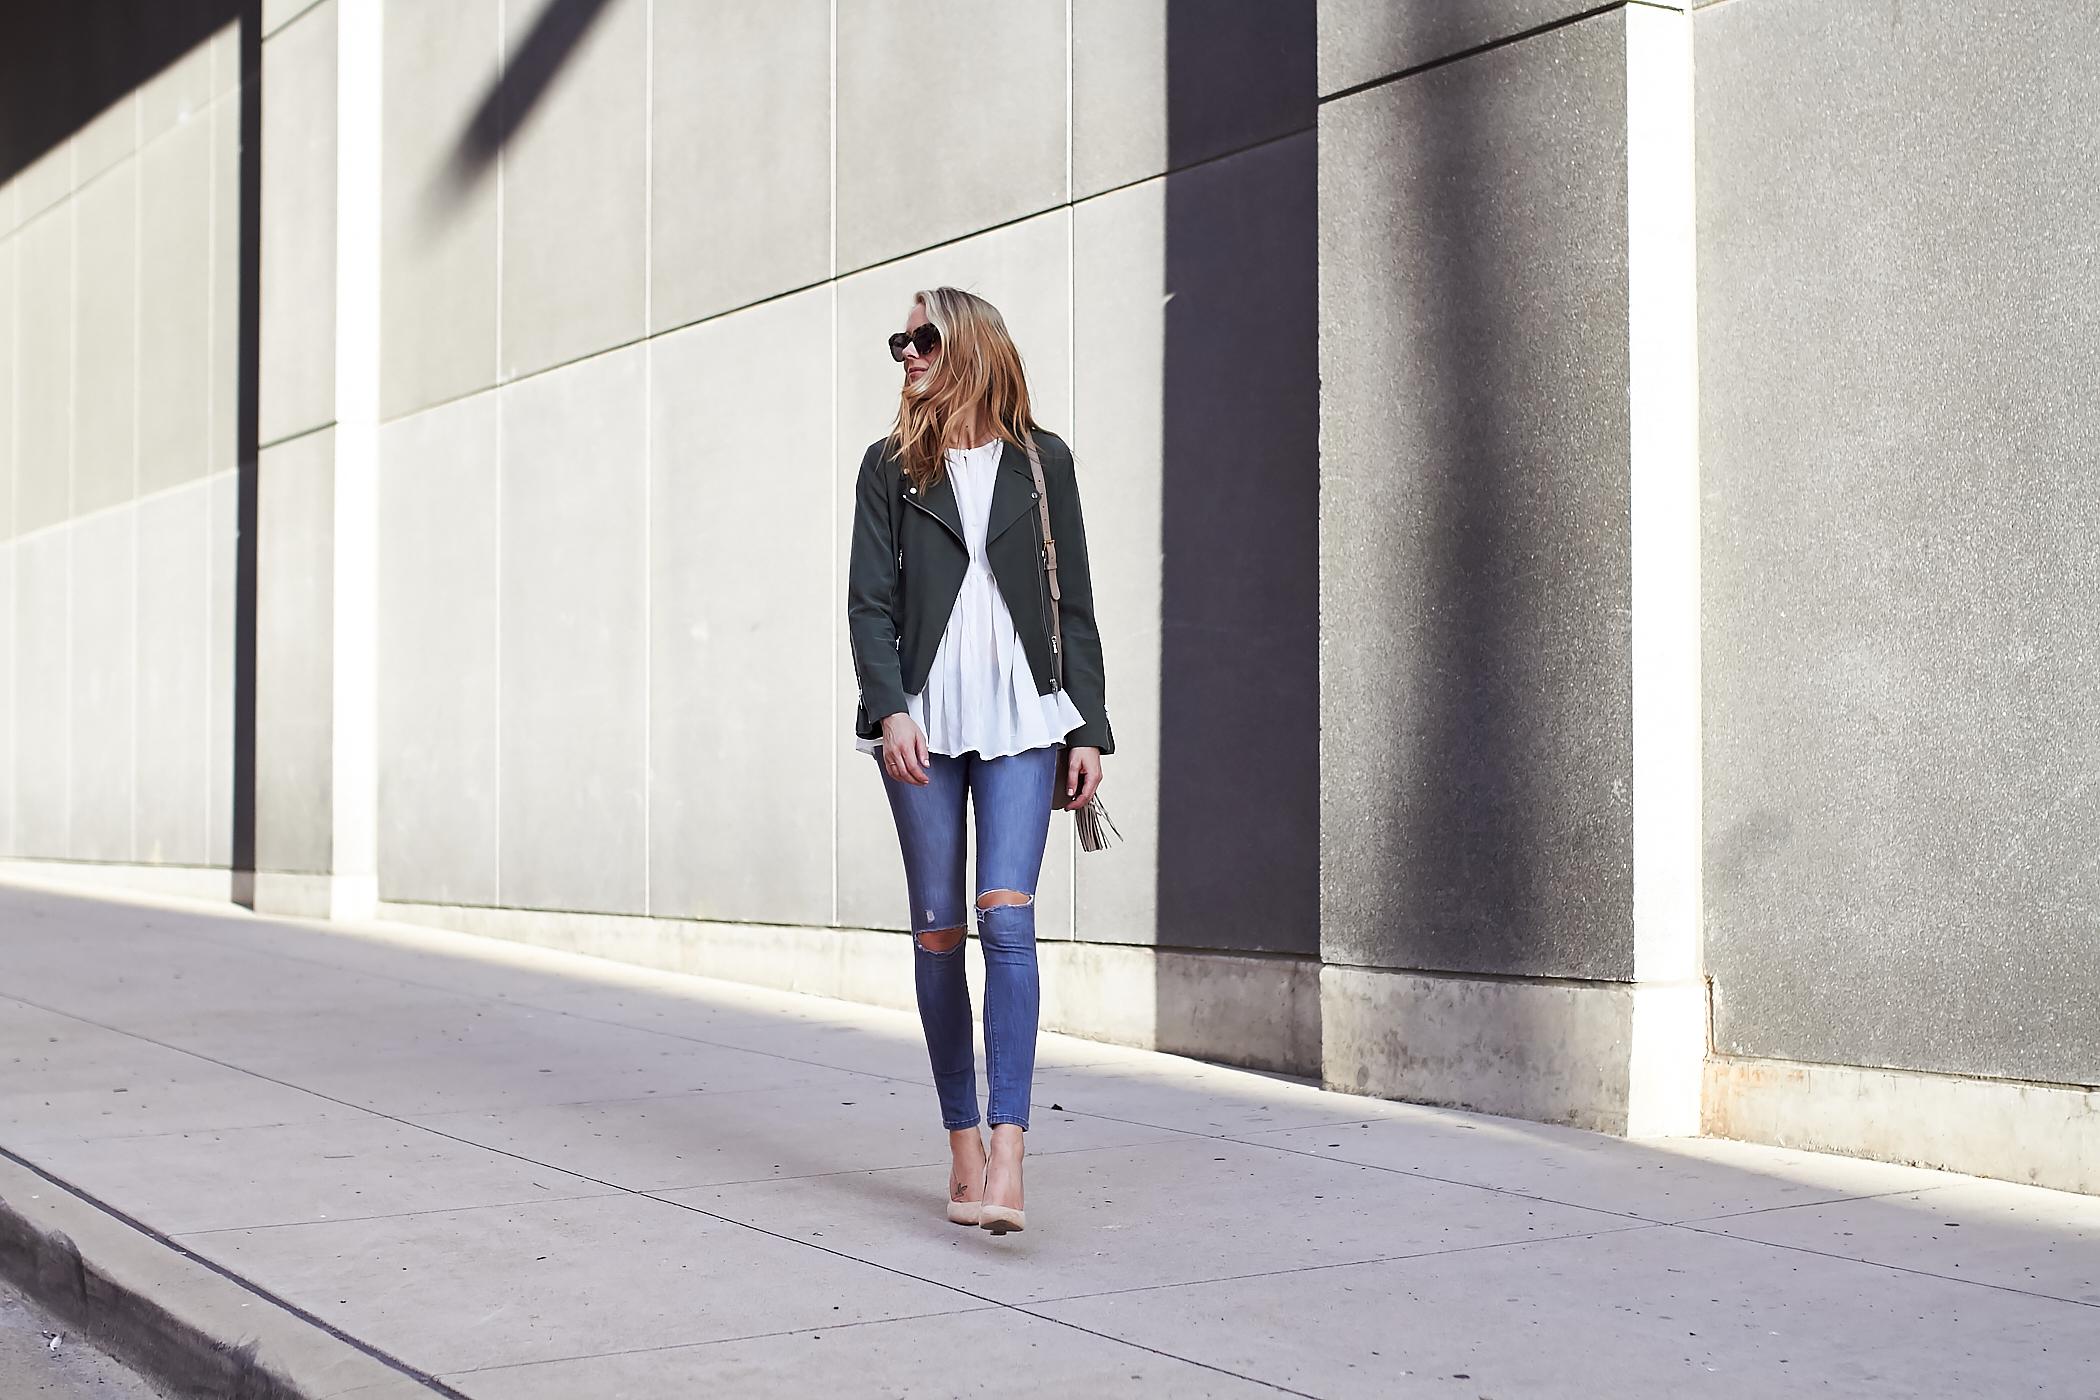 fashion-jackson-olive-green-moto-jacket-ripped-denim-jeans-white-blouse